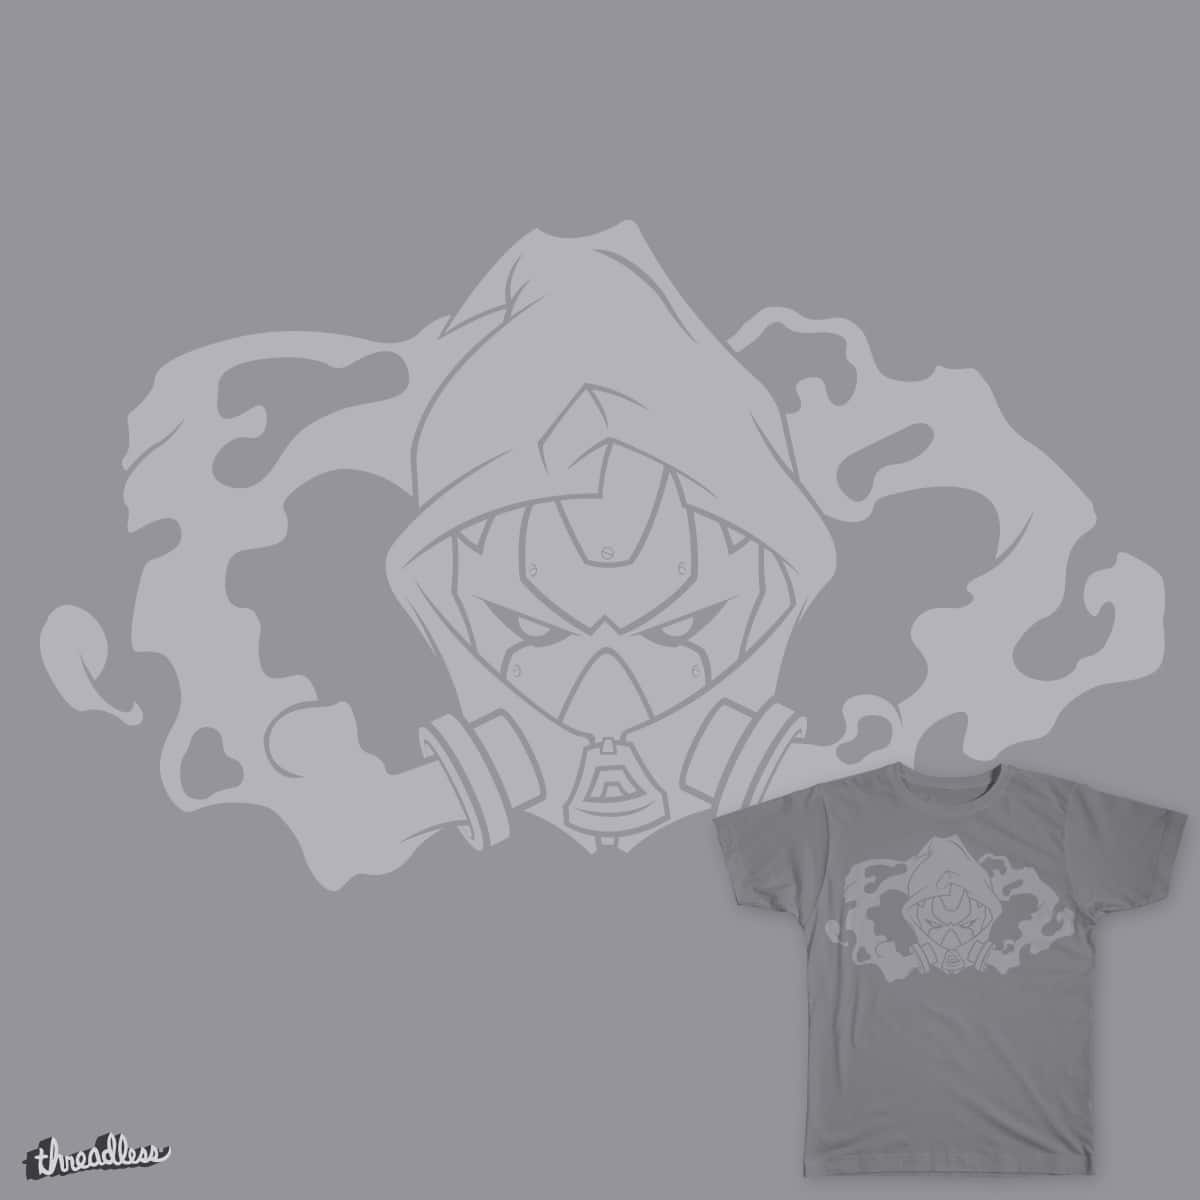 Smog by BanneretDesign on Threadless